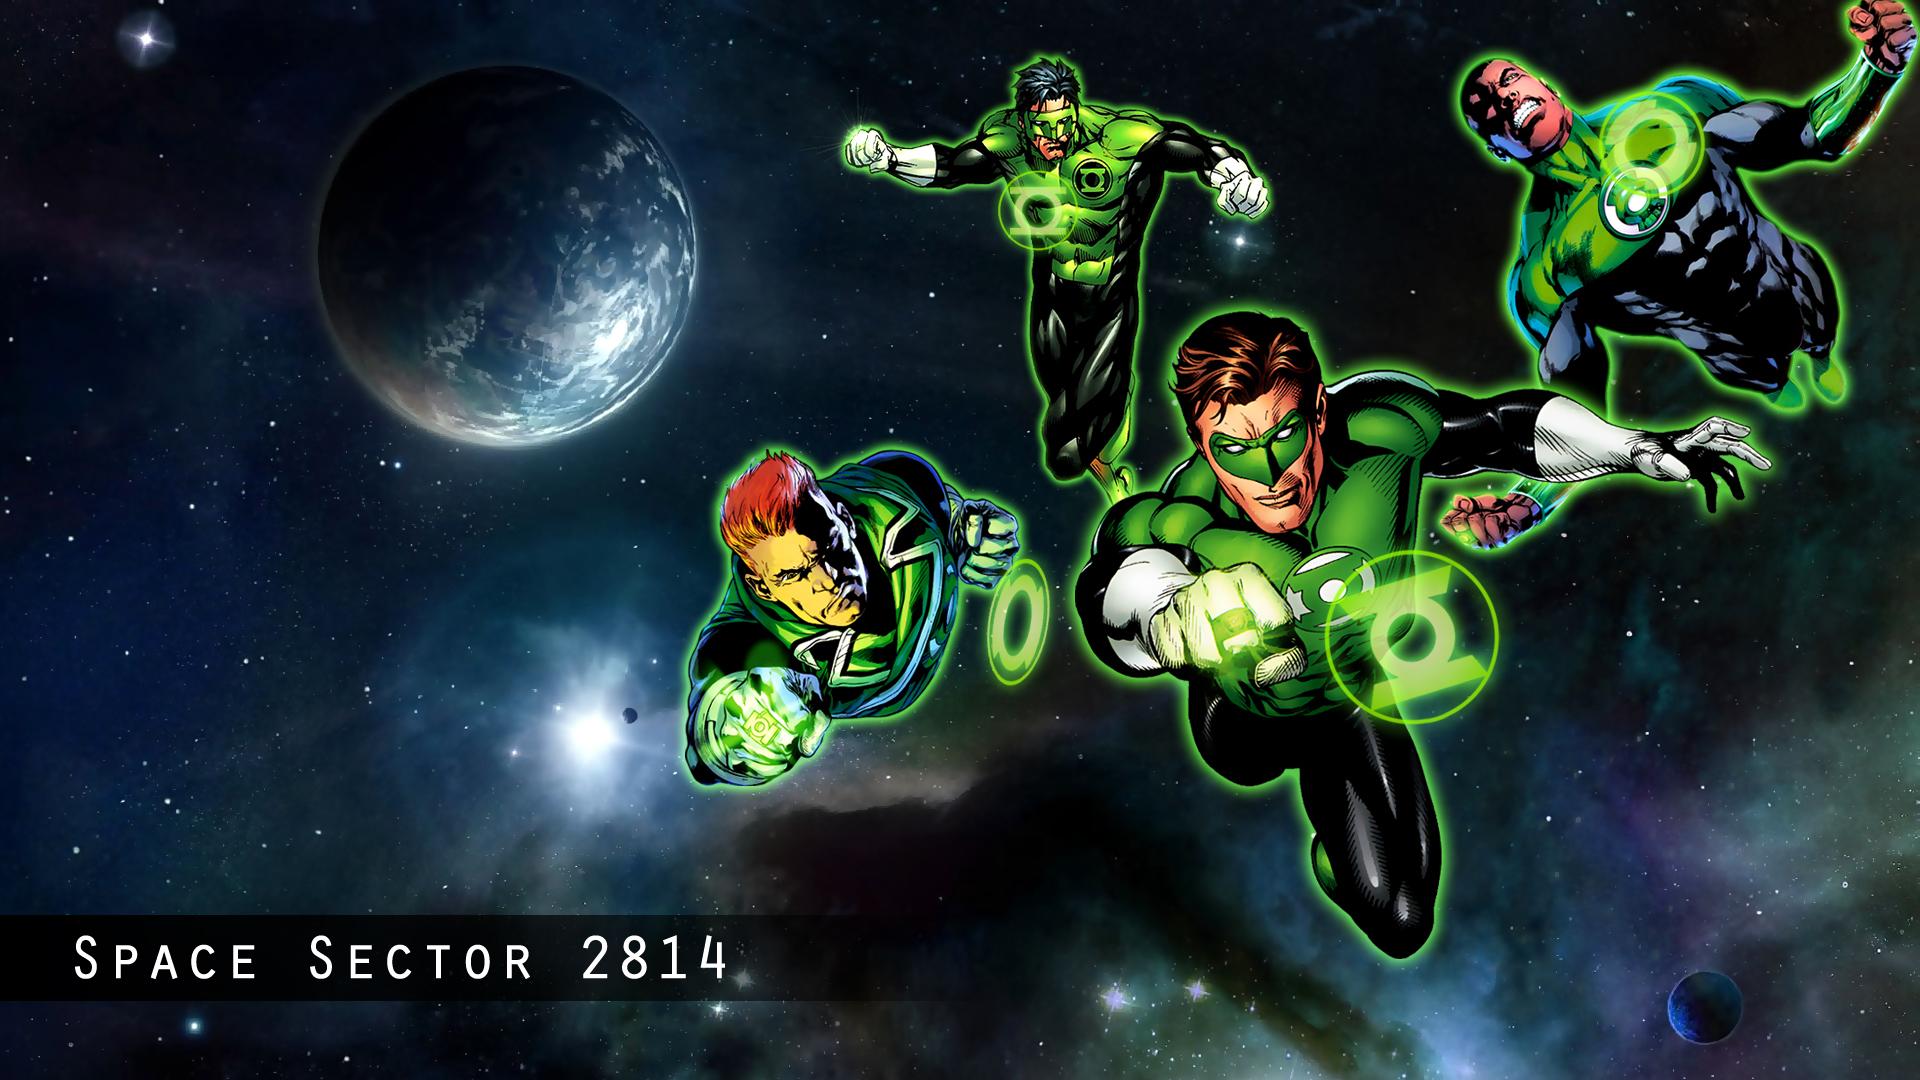 green lantern artwork wallpaper - photo #17